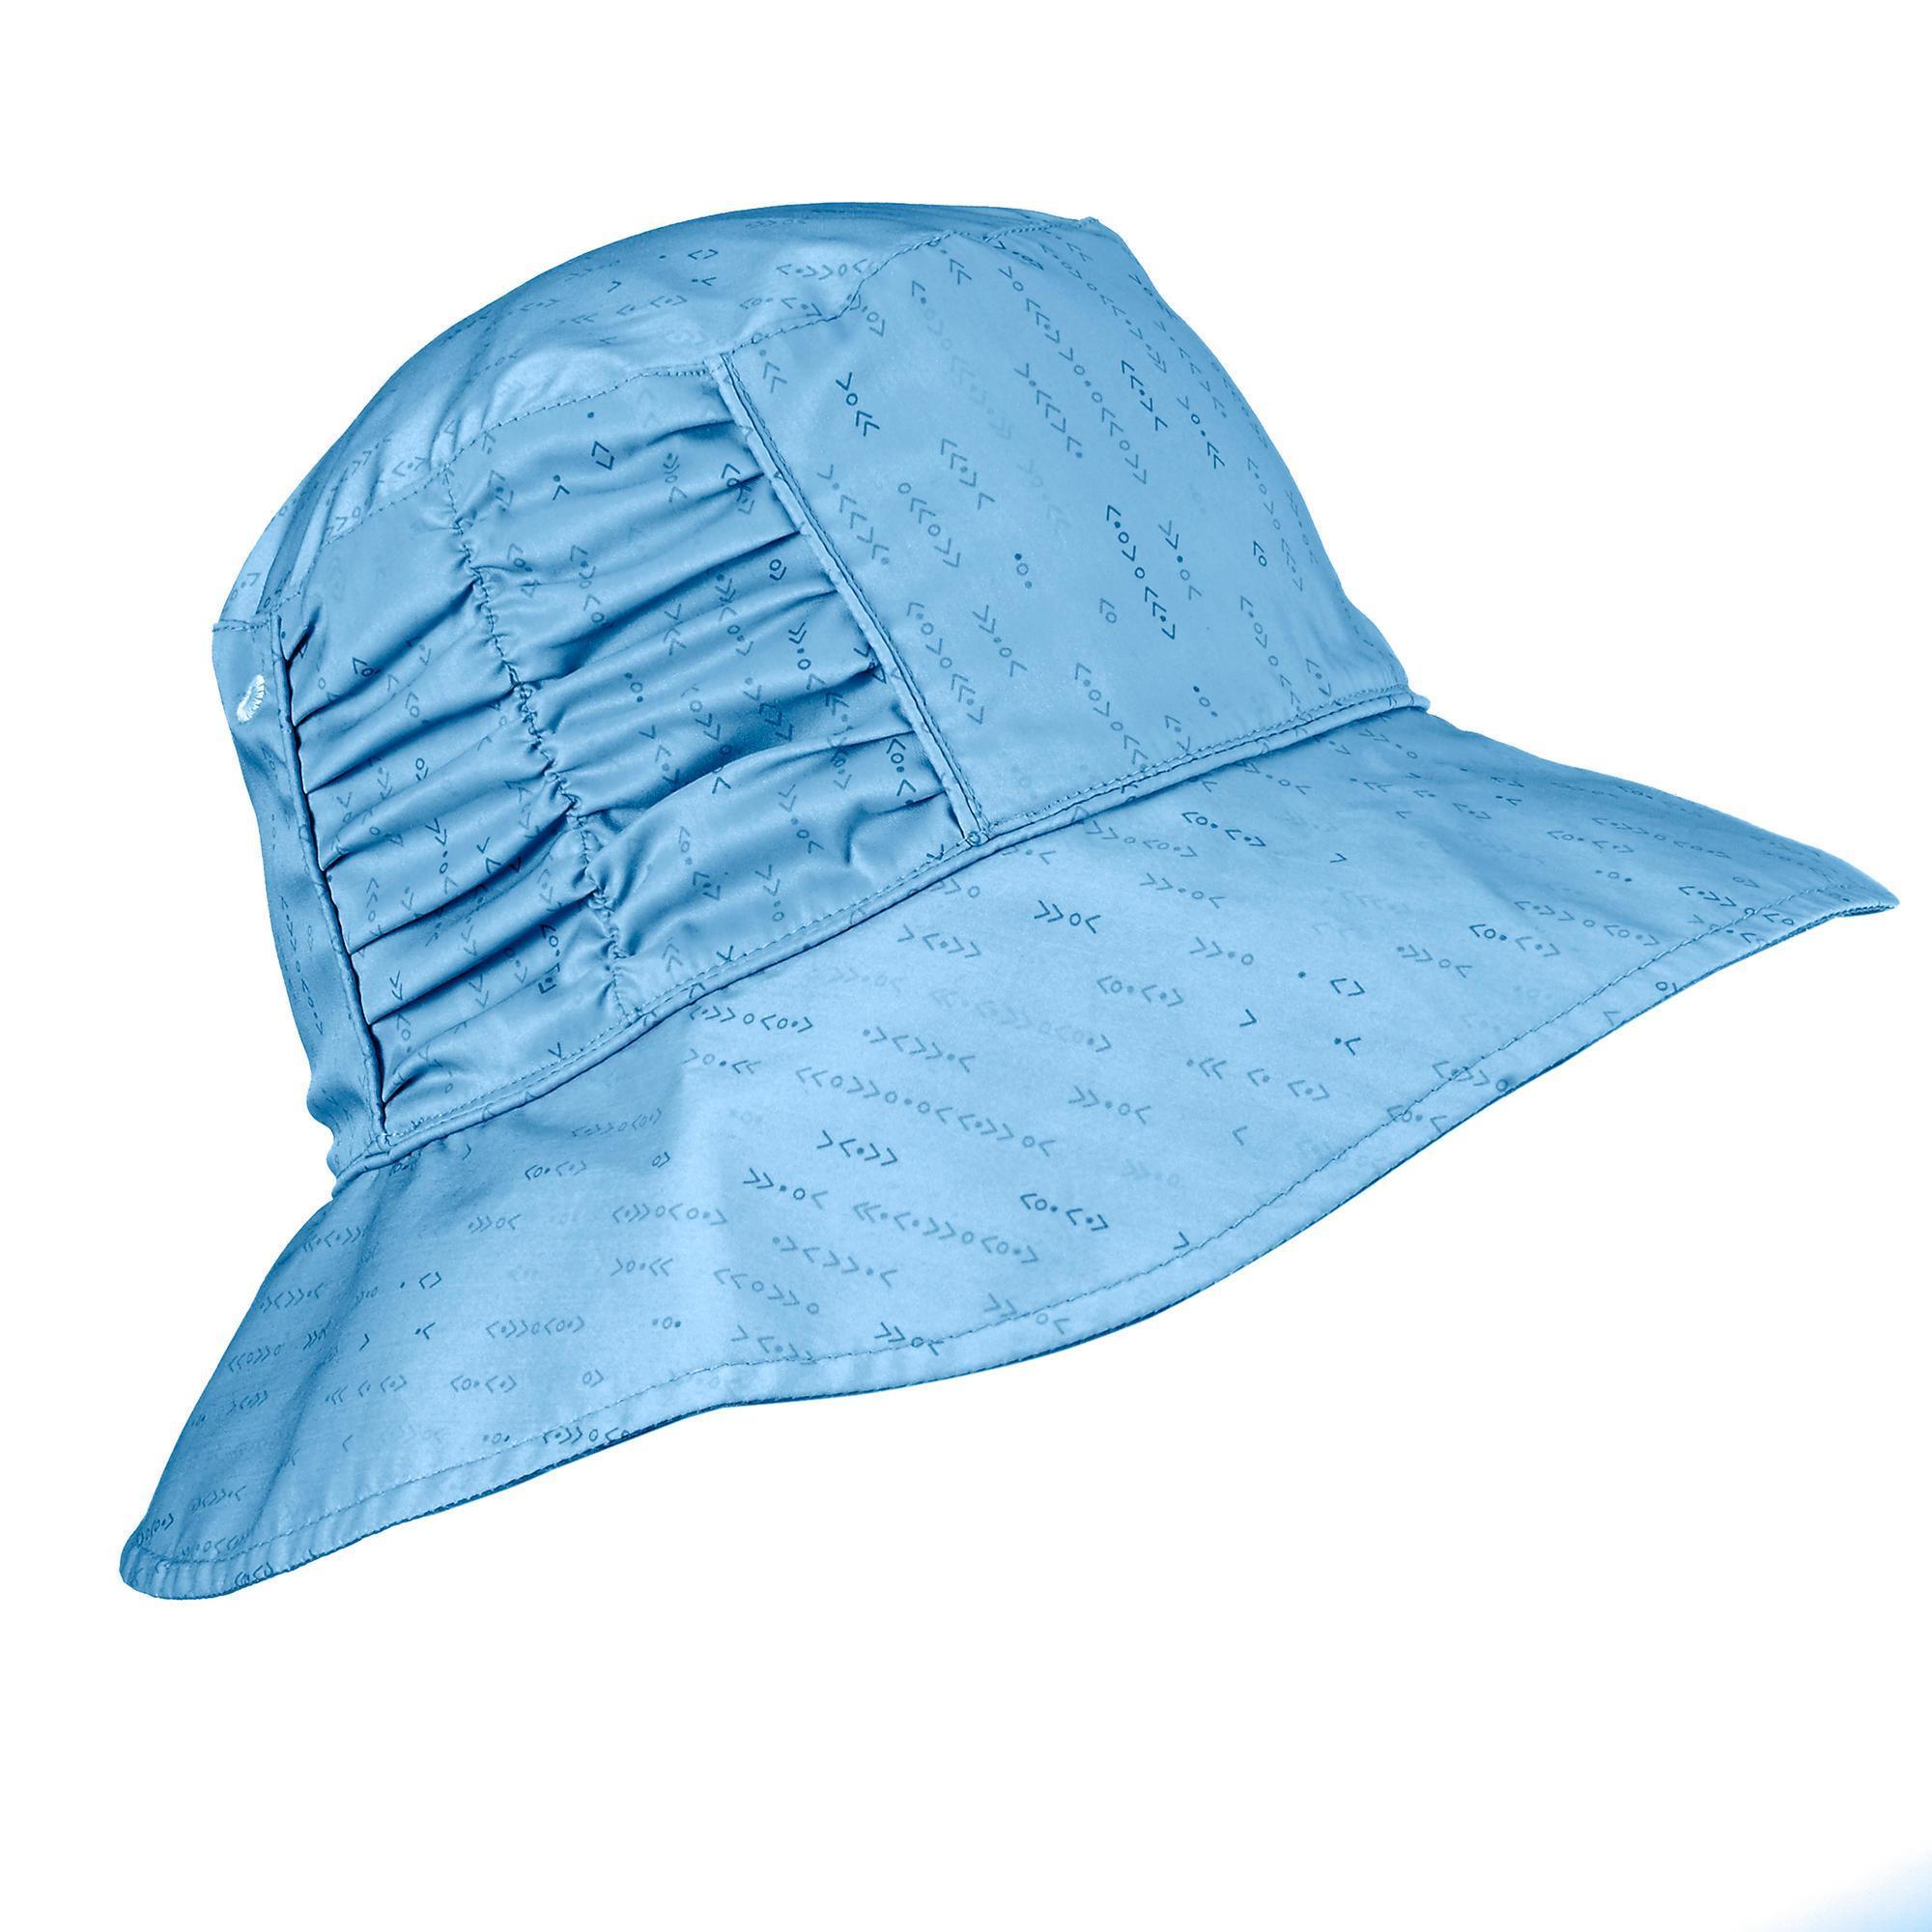 Comprar Sombreros para Deporte  6803530cac6